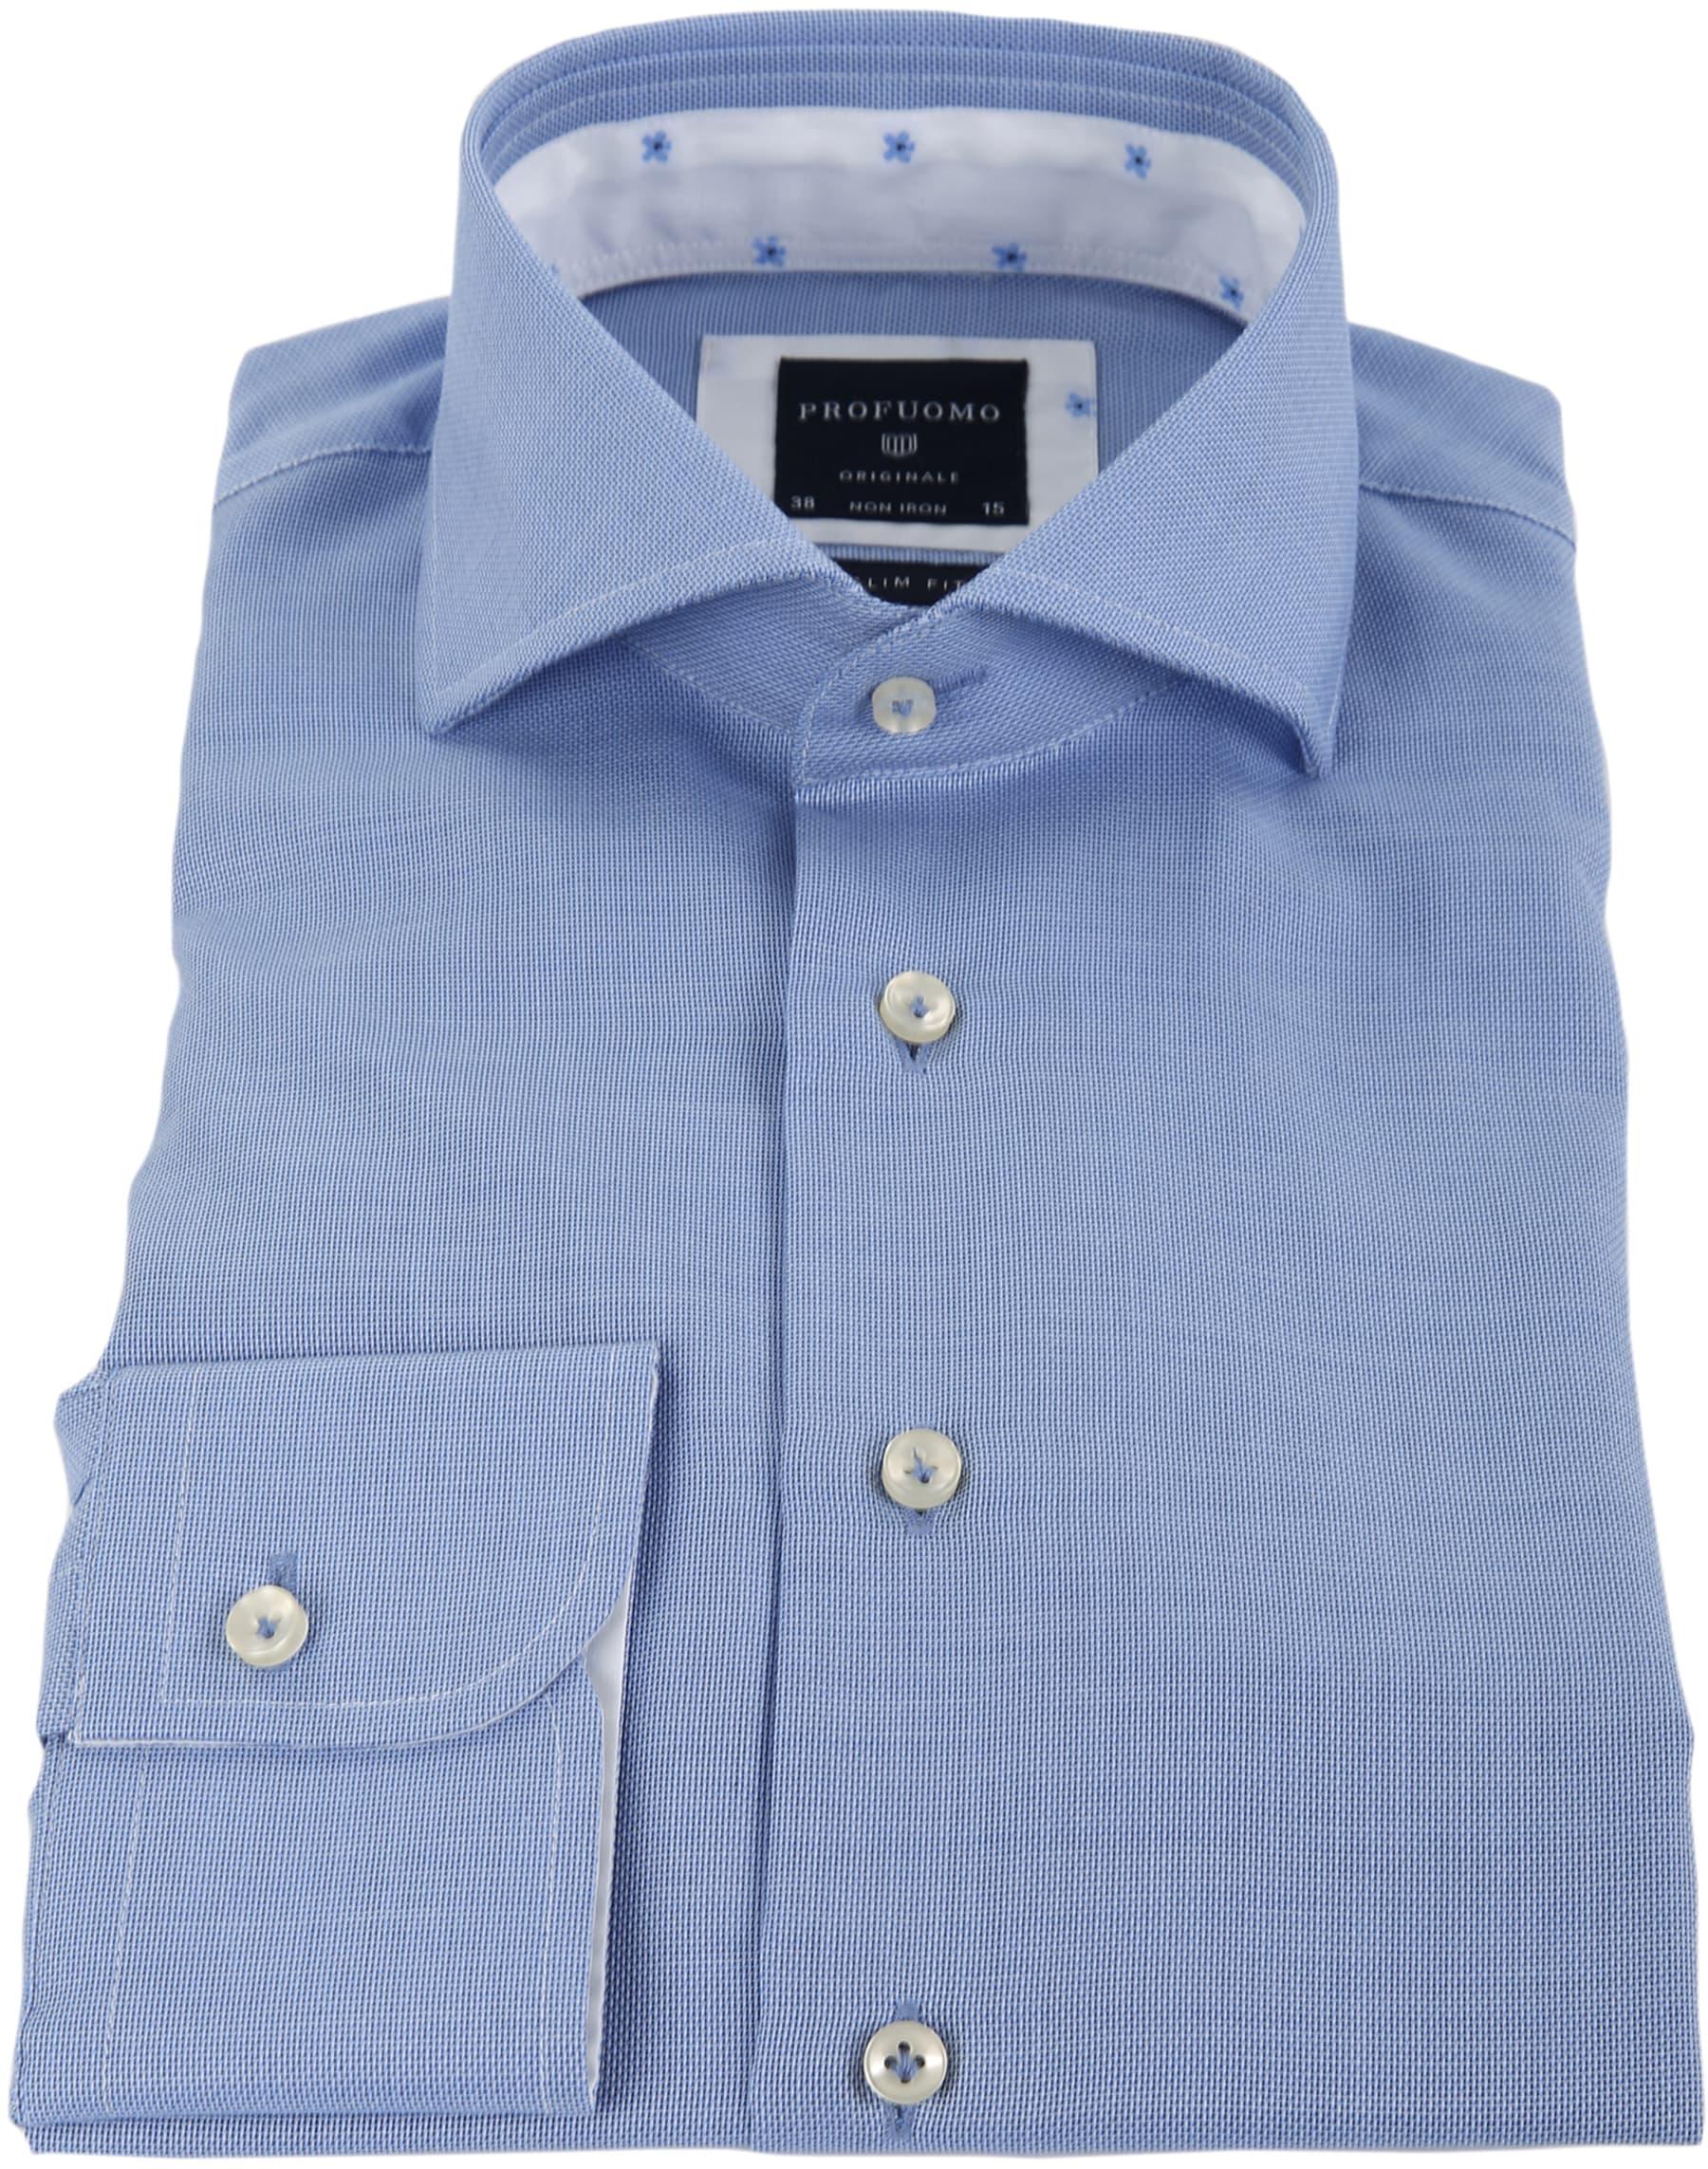 Profuomo Overhemd SC Blue foto 1